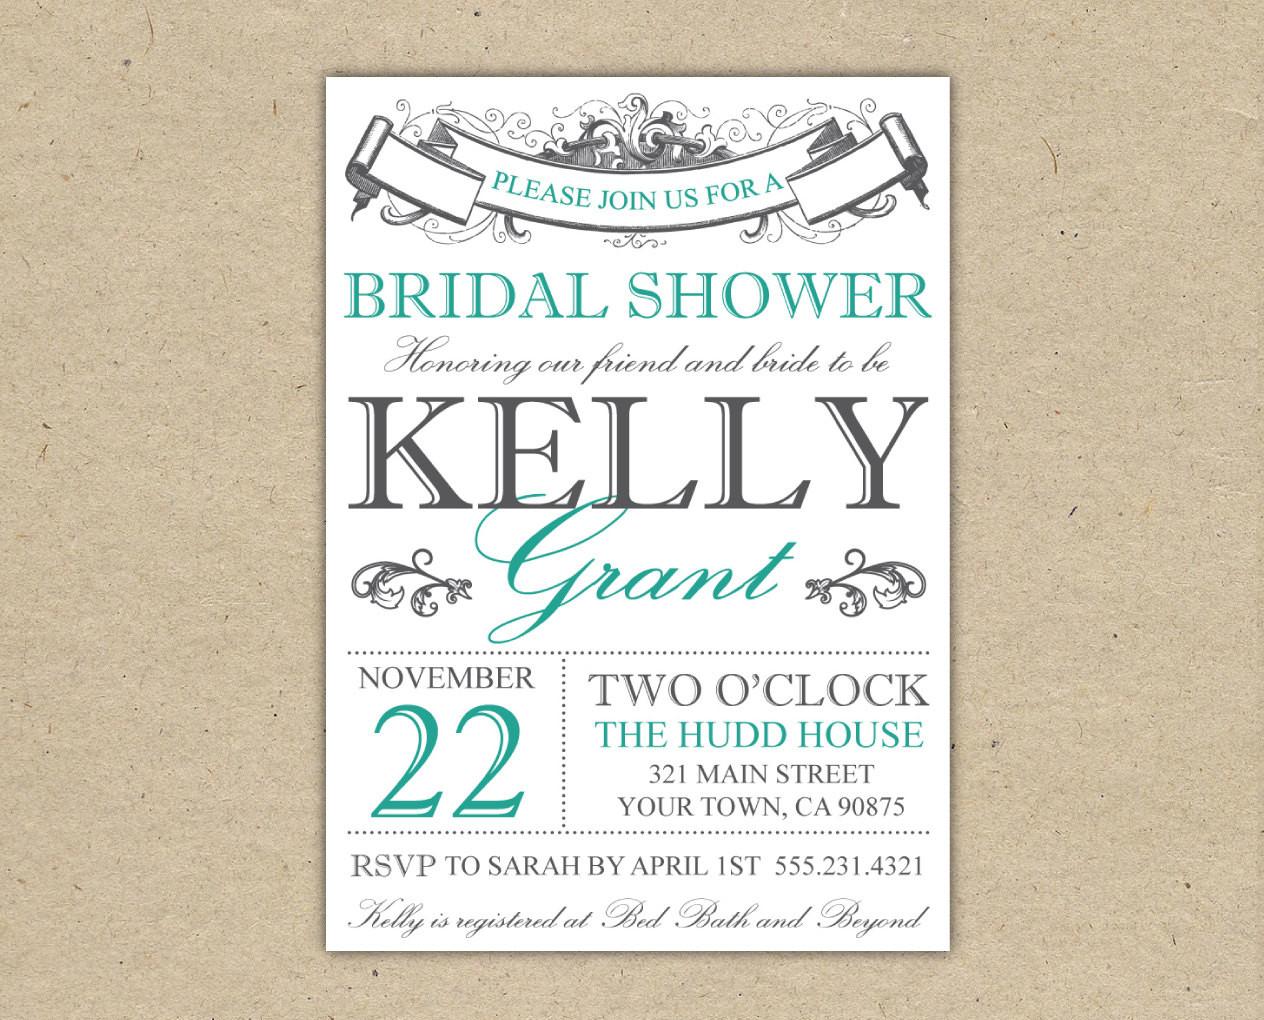 008 Free Printable Bridal Shower Invitations Templates Best - Free Printable Bridal Shower Invitations